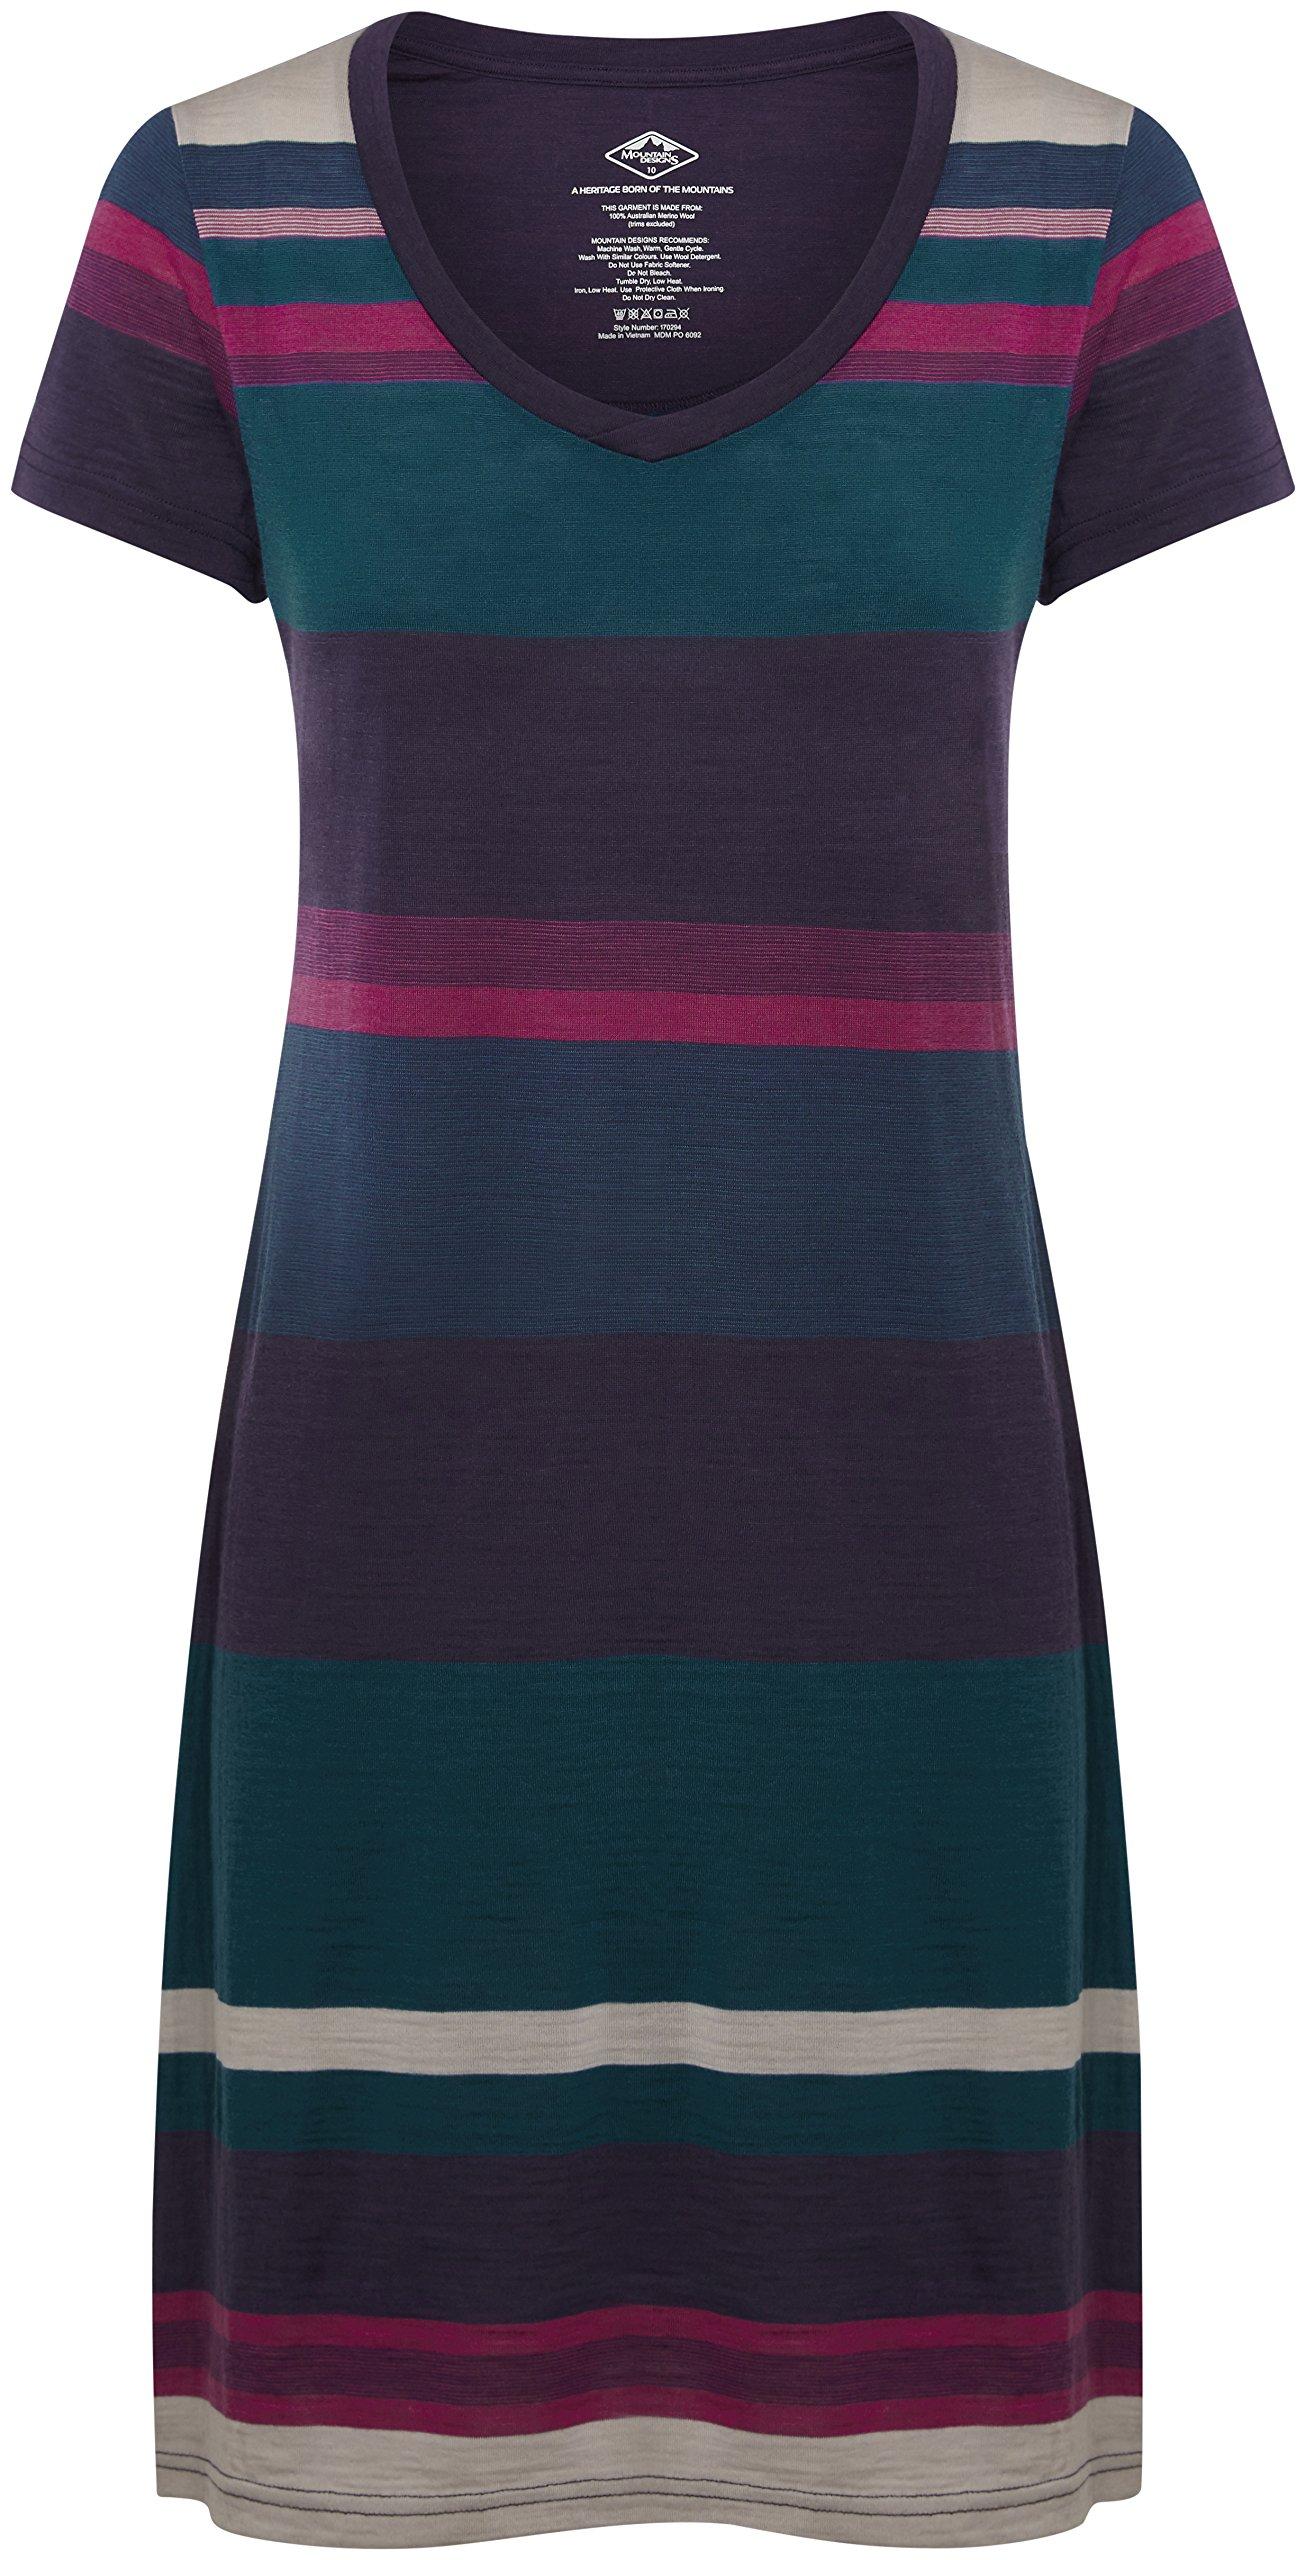 Mountain Designs Women's Pearl Merino Dress, Magenta Stripe, 12